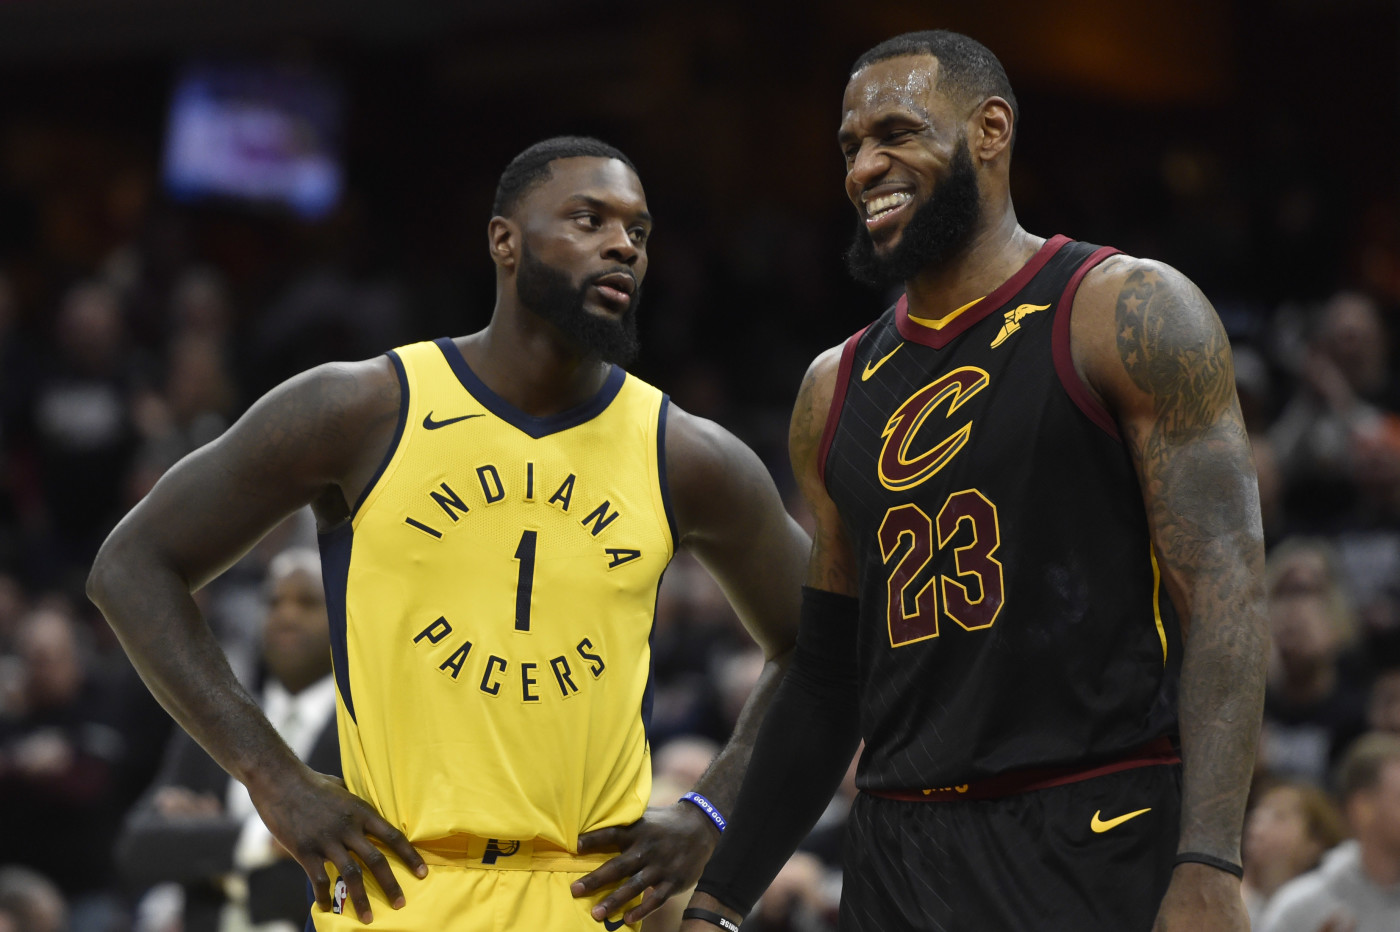 LeBron James Lance Stephenson Game 1 2018 NBA Playoffs